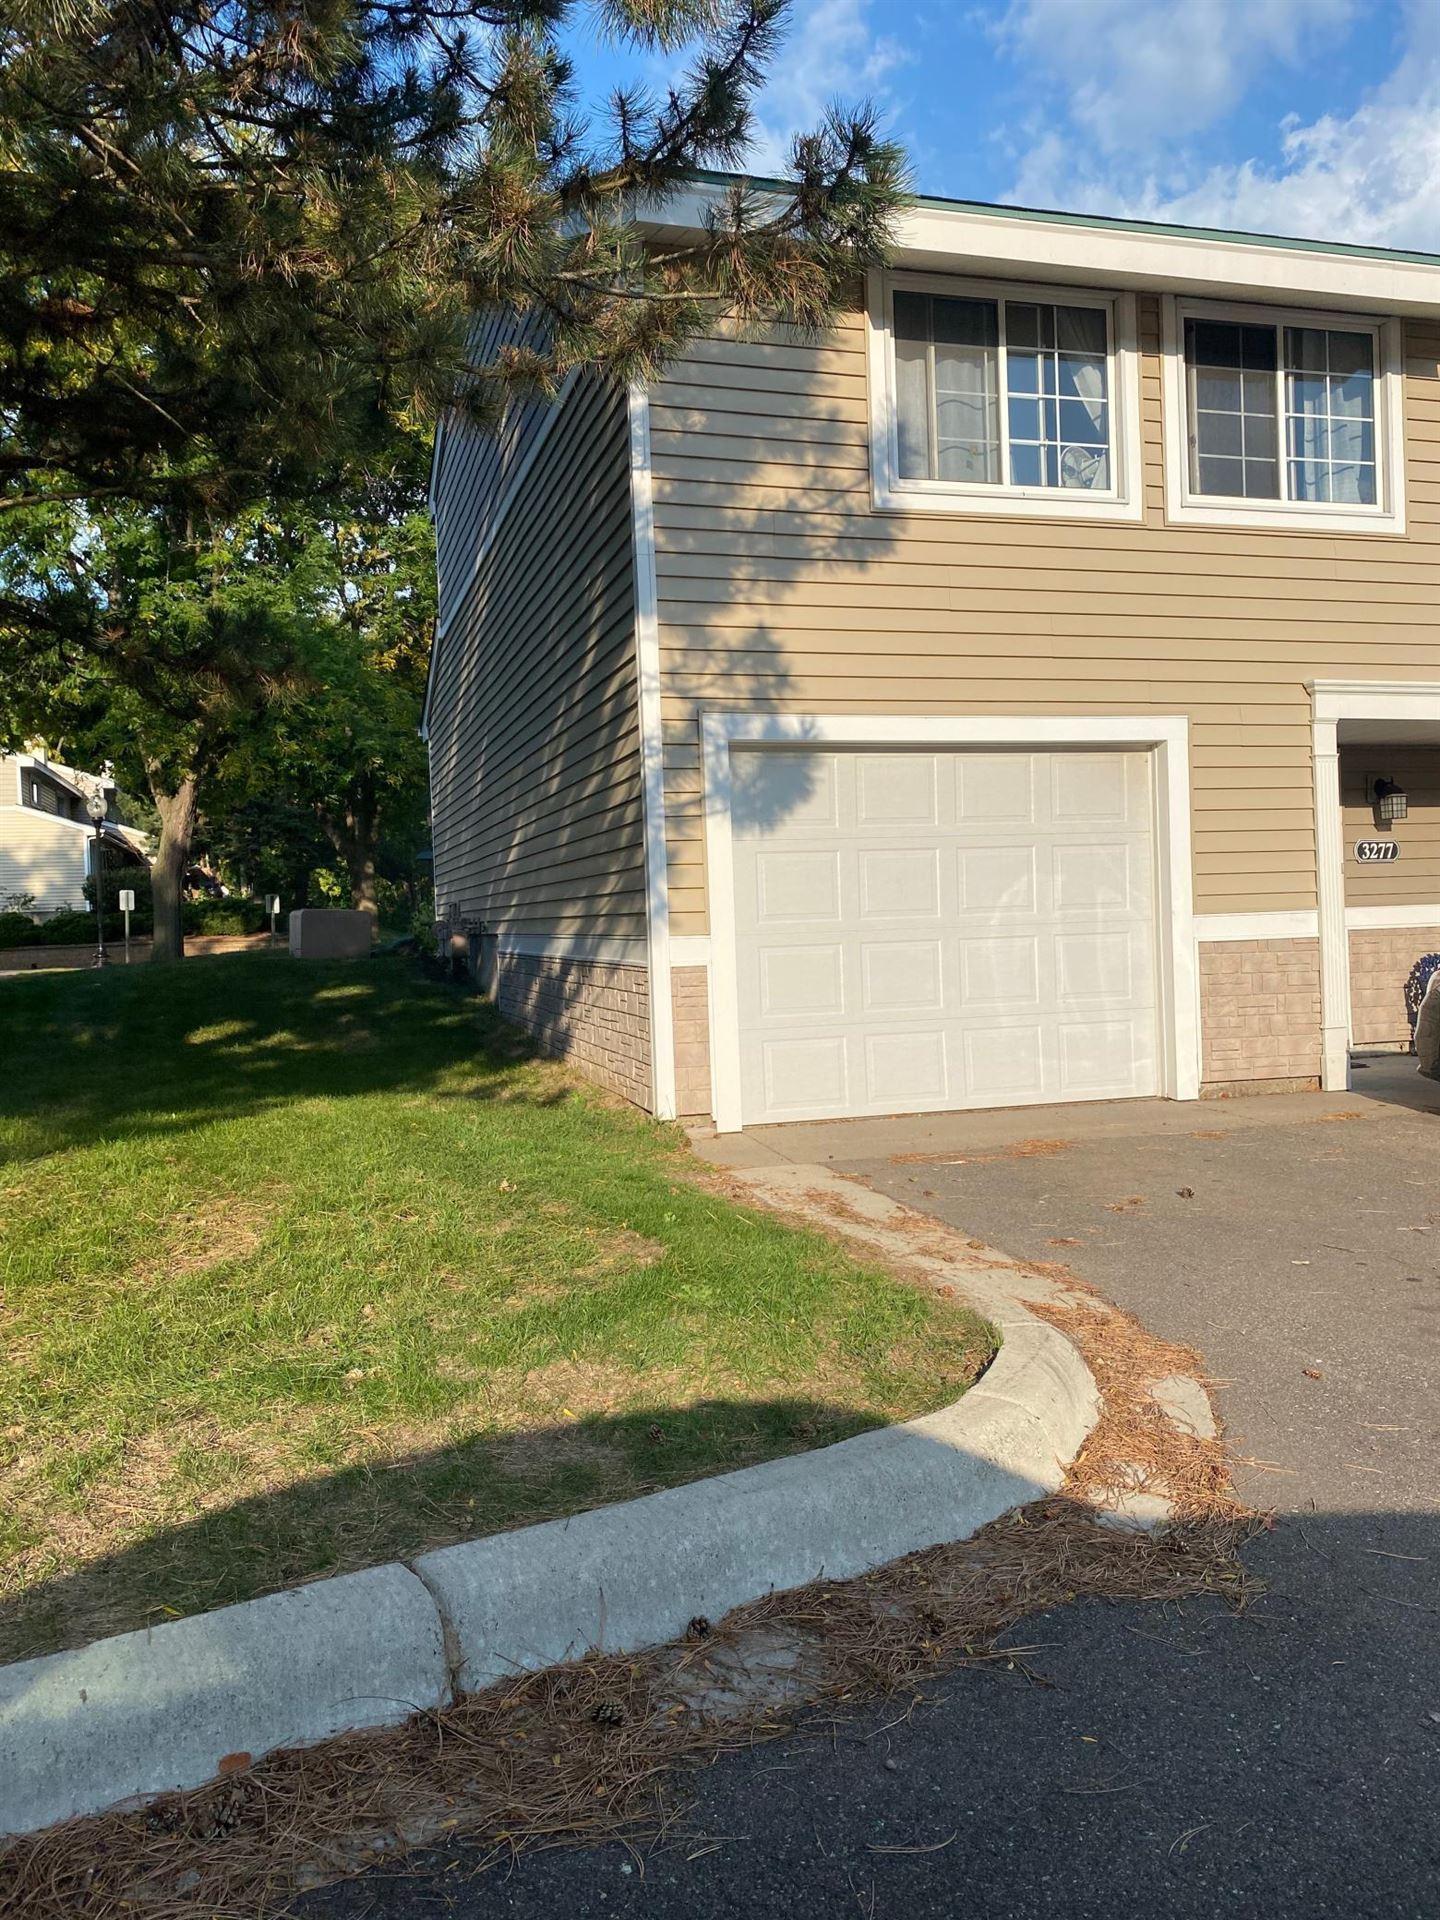 Photo of 3277 Valley Ridge Drive #36, Eagan, MN 55121 (MLS # 6101034)